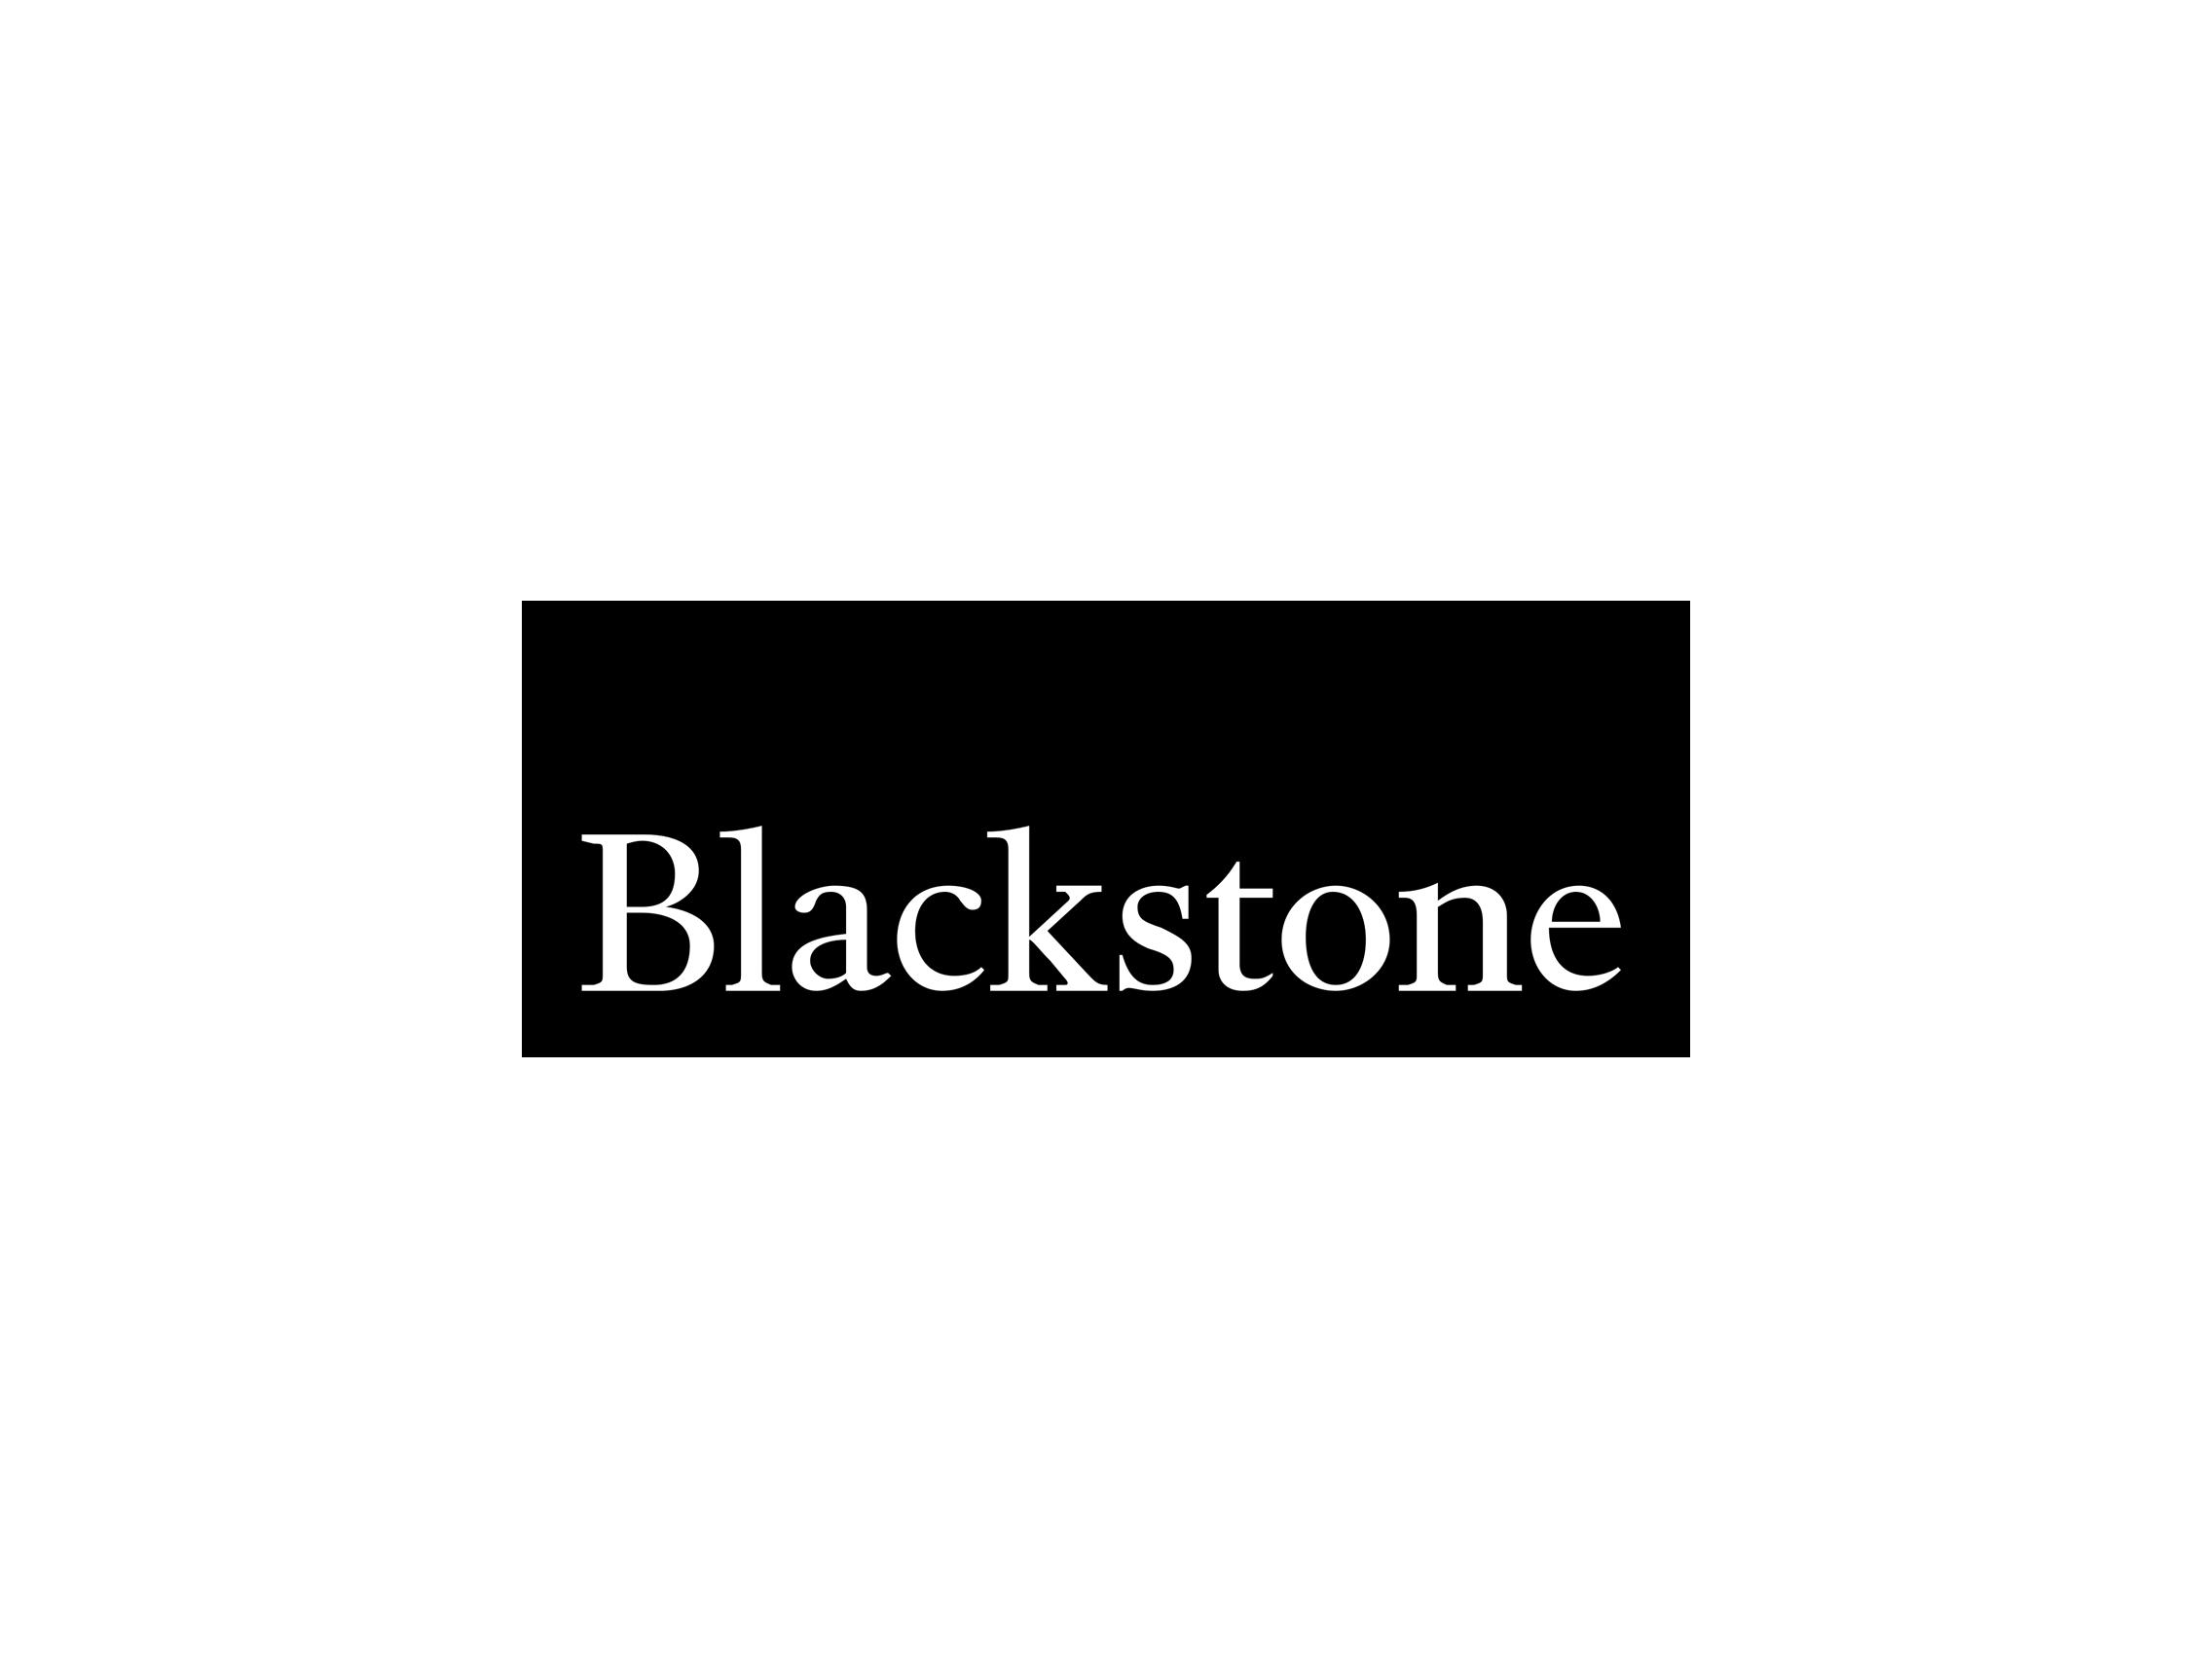 blackstone logo - photo #1